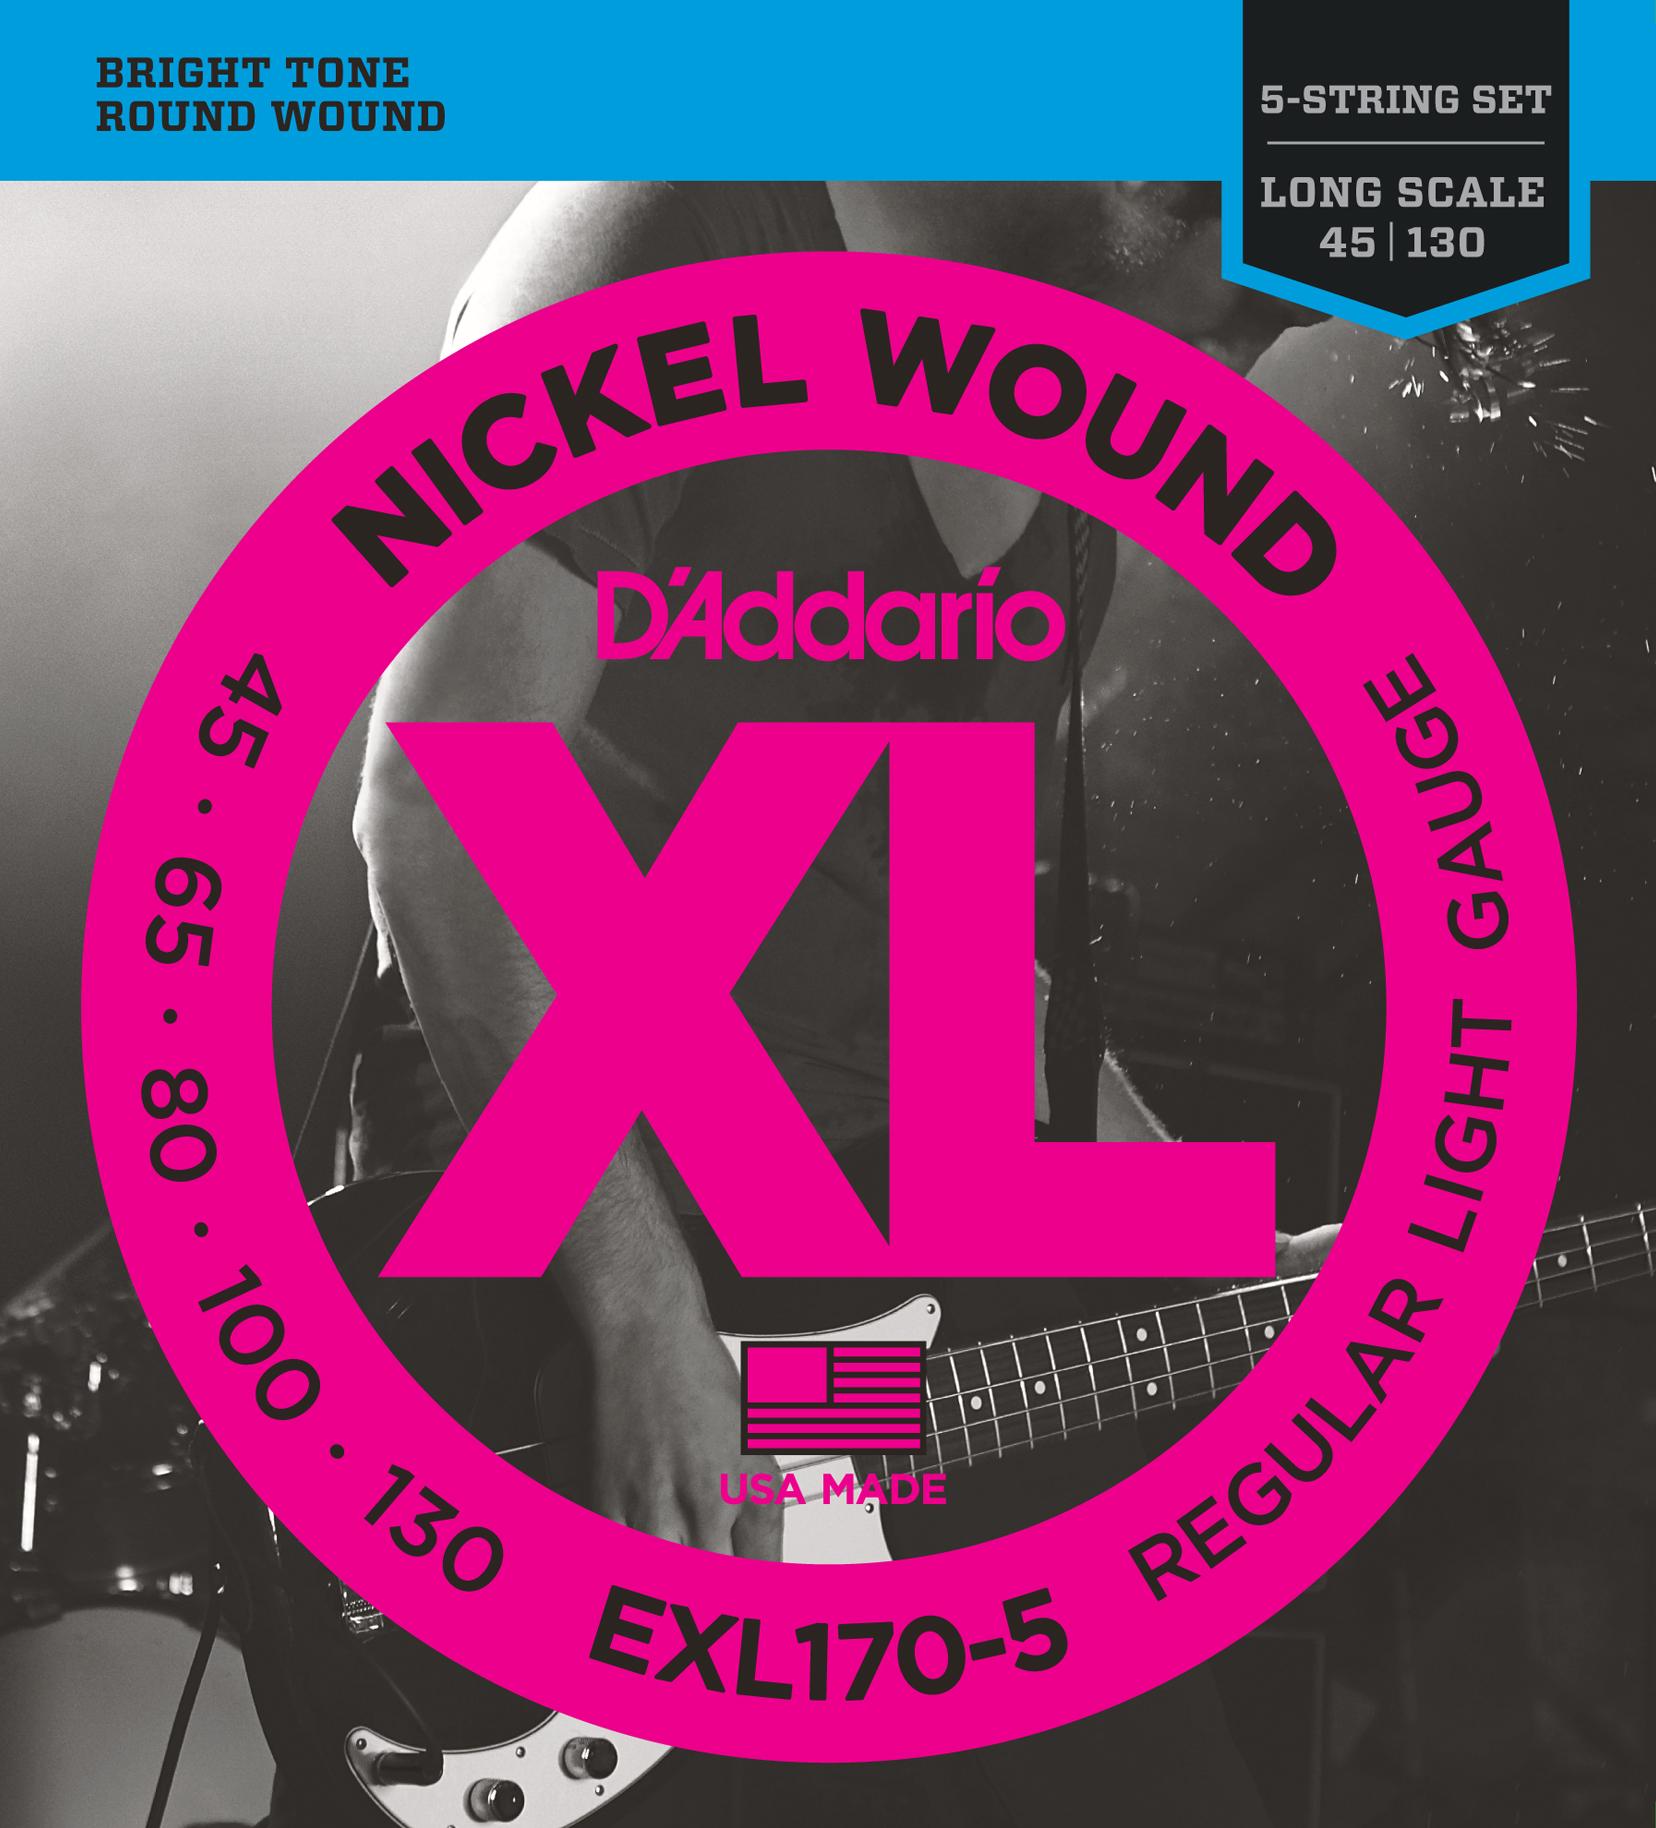 D'Addario EXL170-5 5-String Nickel Wound Bass Guitar Strings, Light, 45-130, Lon...